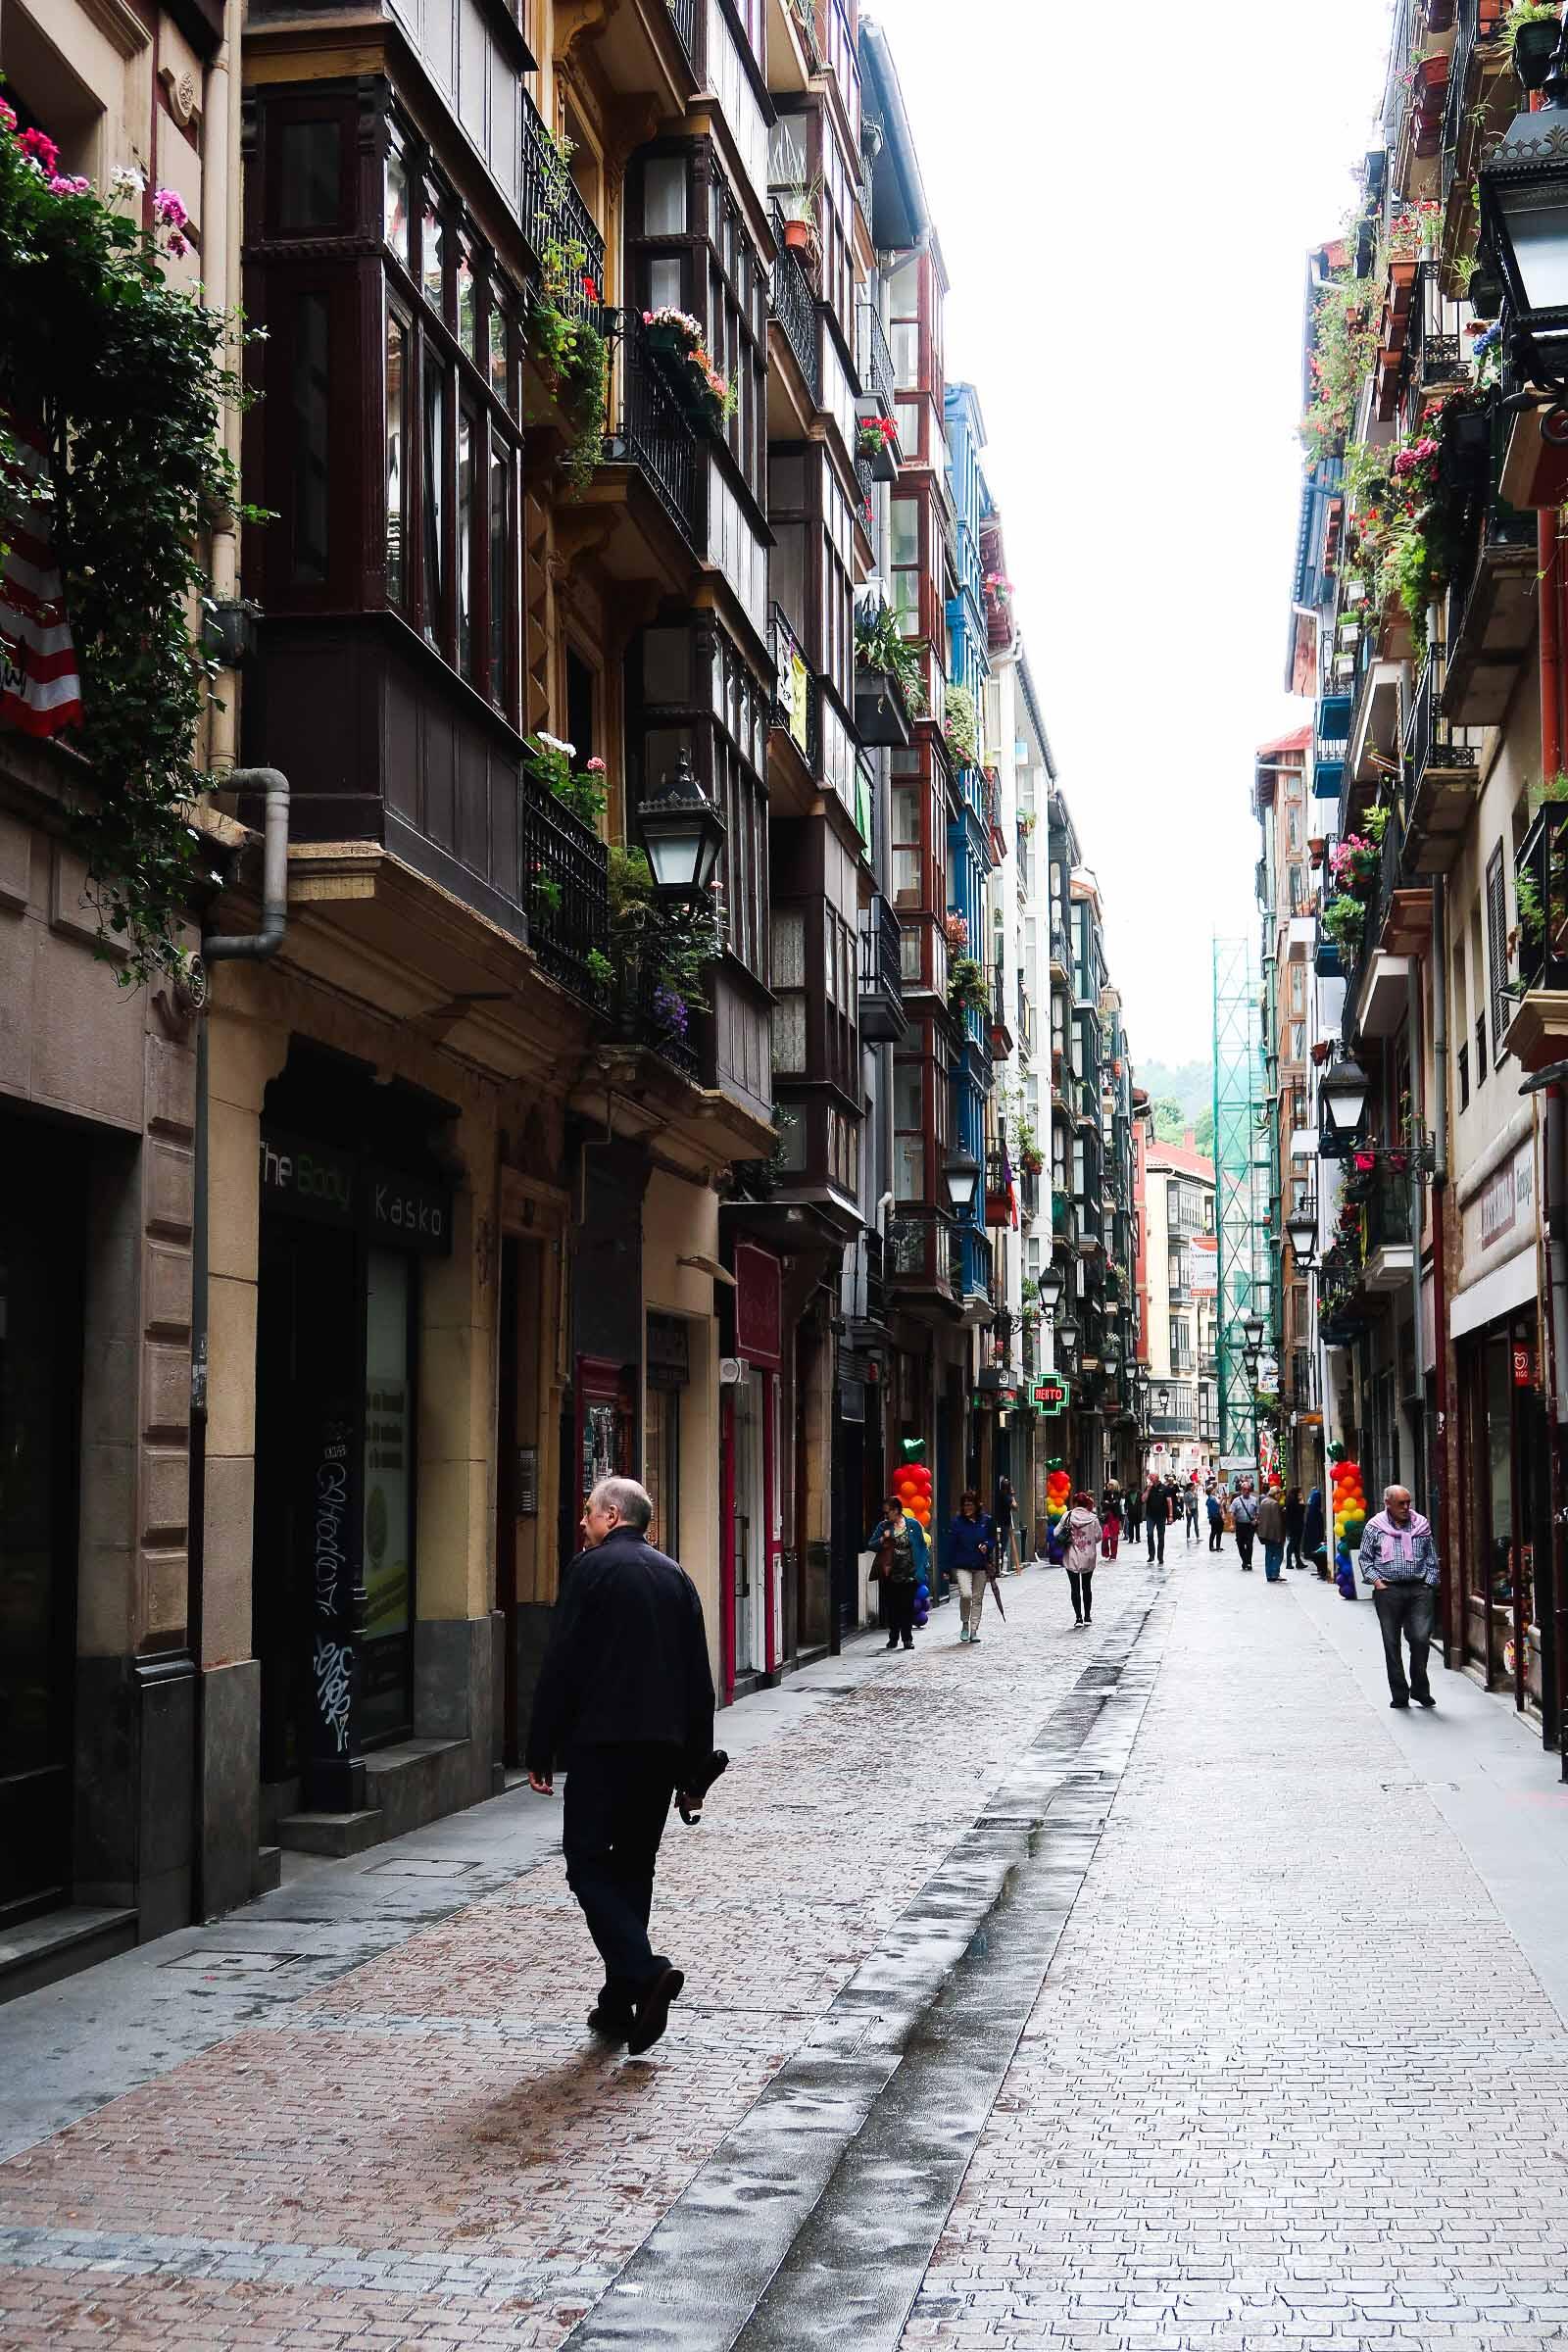 Casco Viejo, Old Town   A Guide to The Best Pintxos Bars in Bilbao   Mondomulia